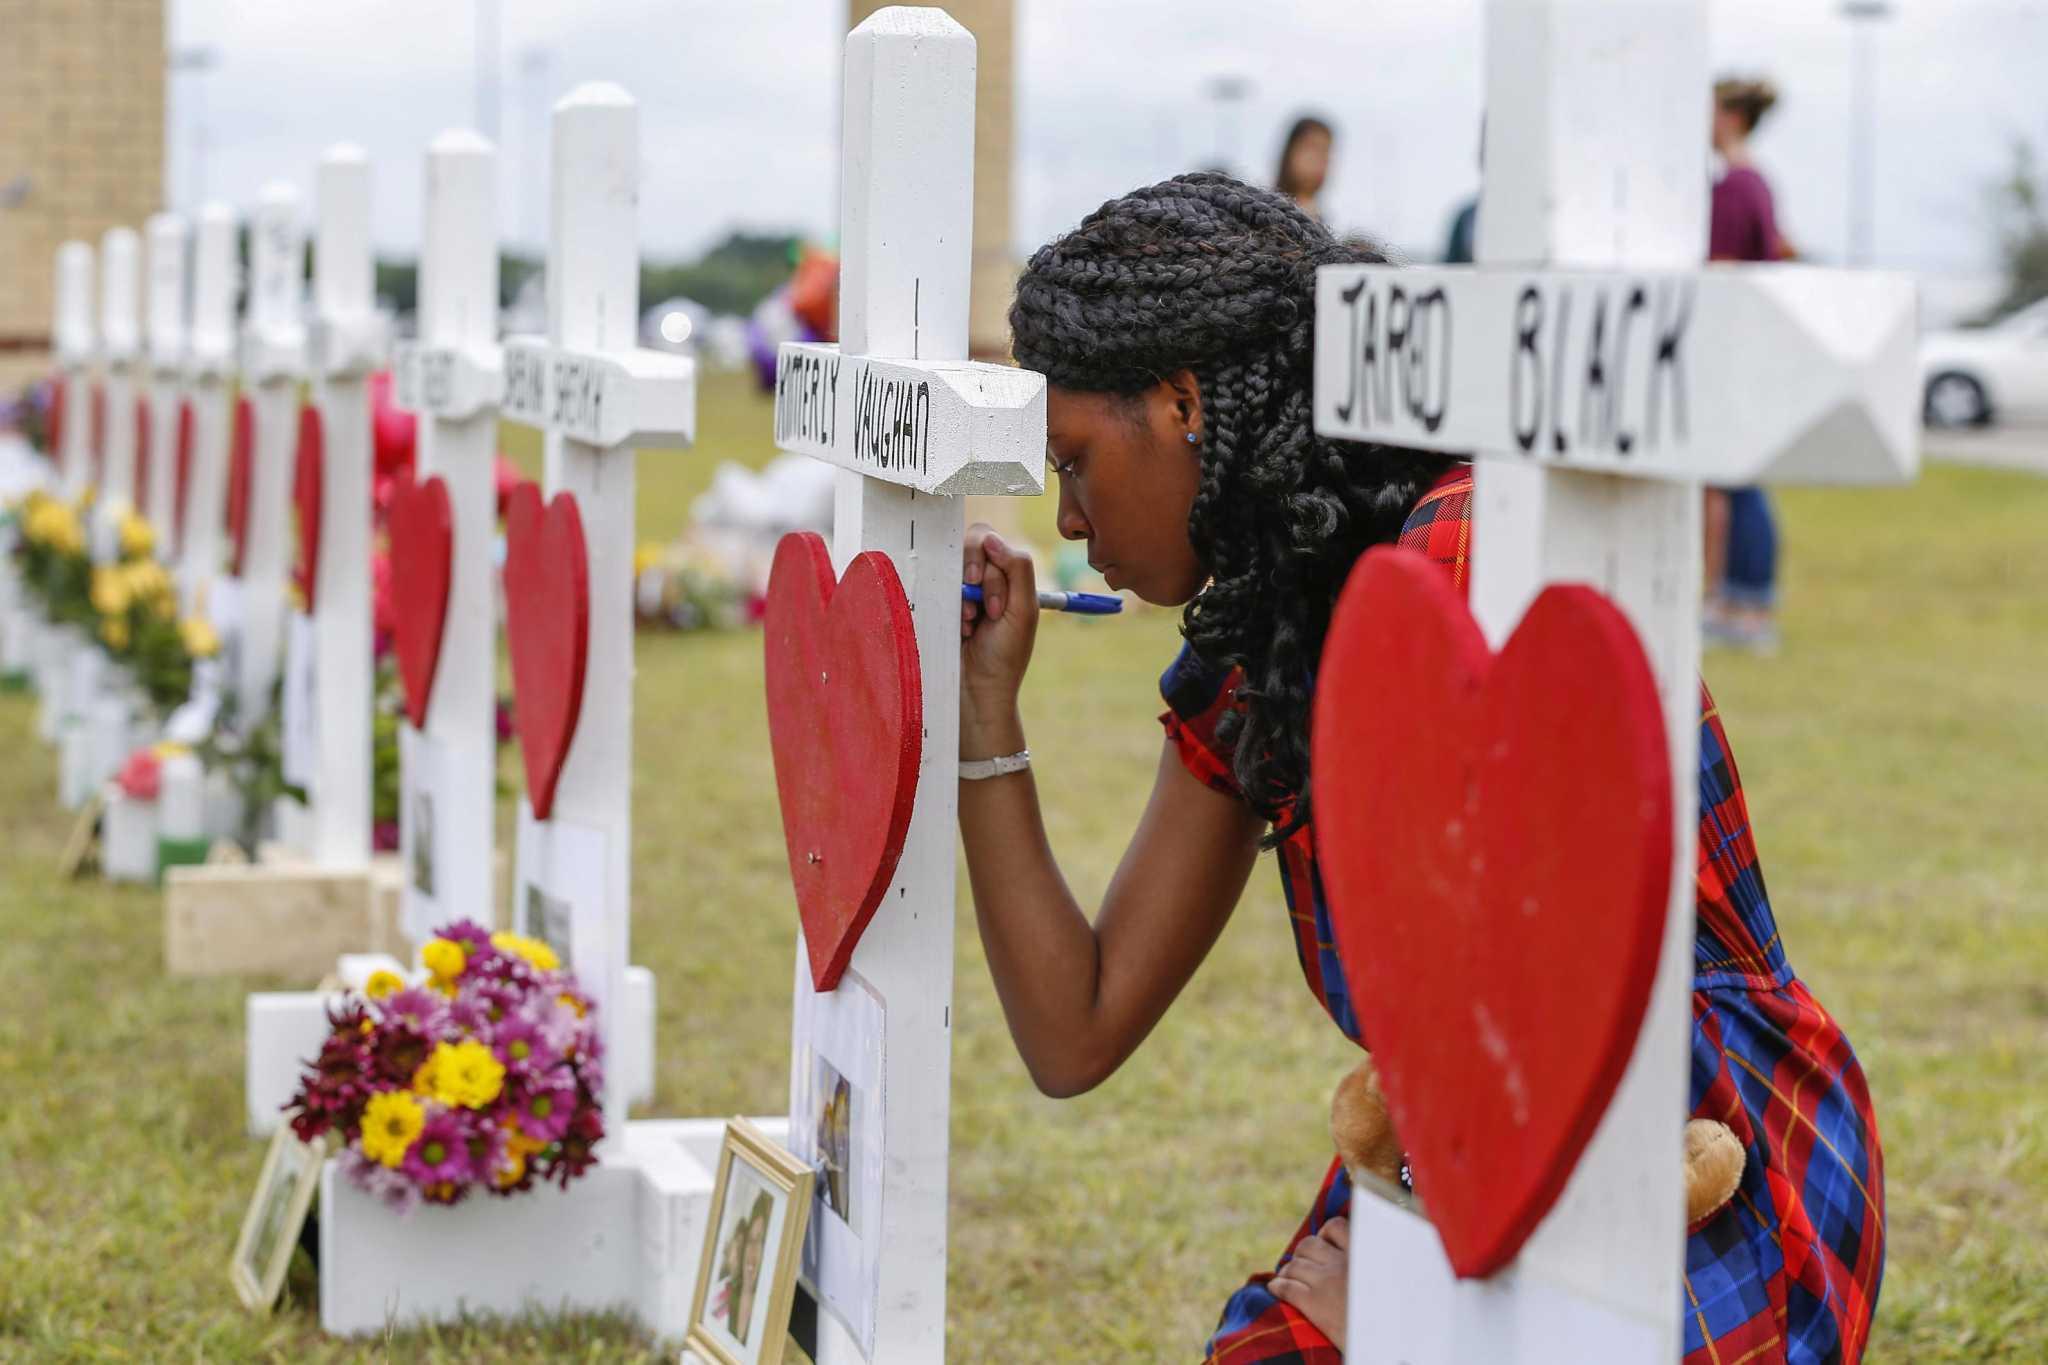 Q&A: Santa Fe shooting survivor on solutions, long-term impact